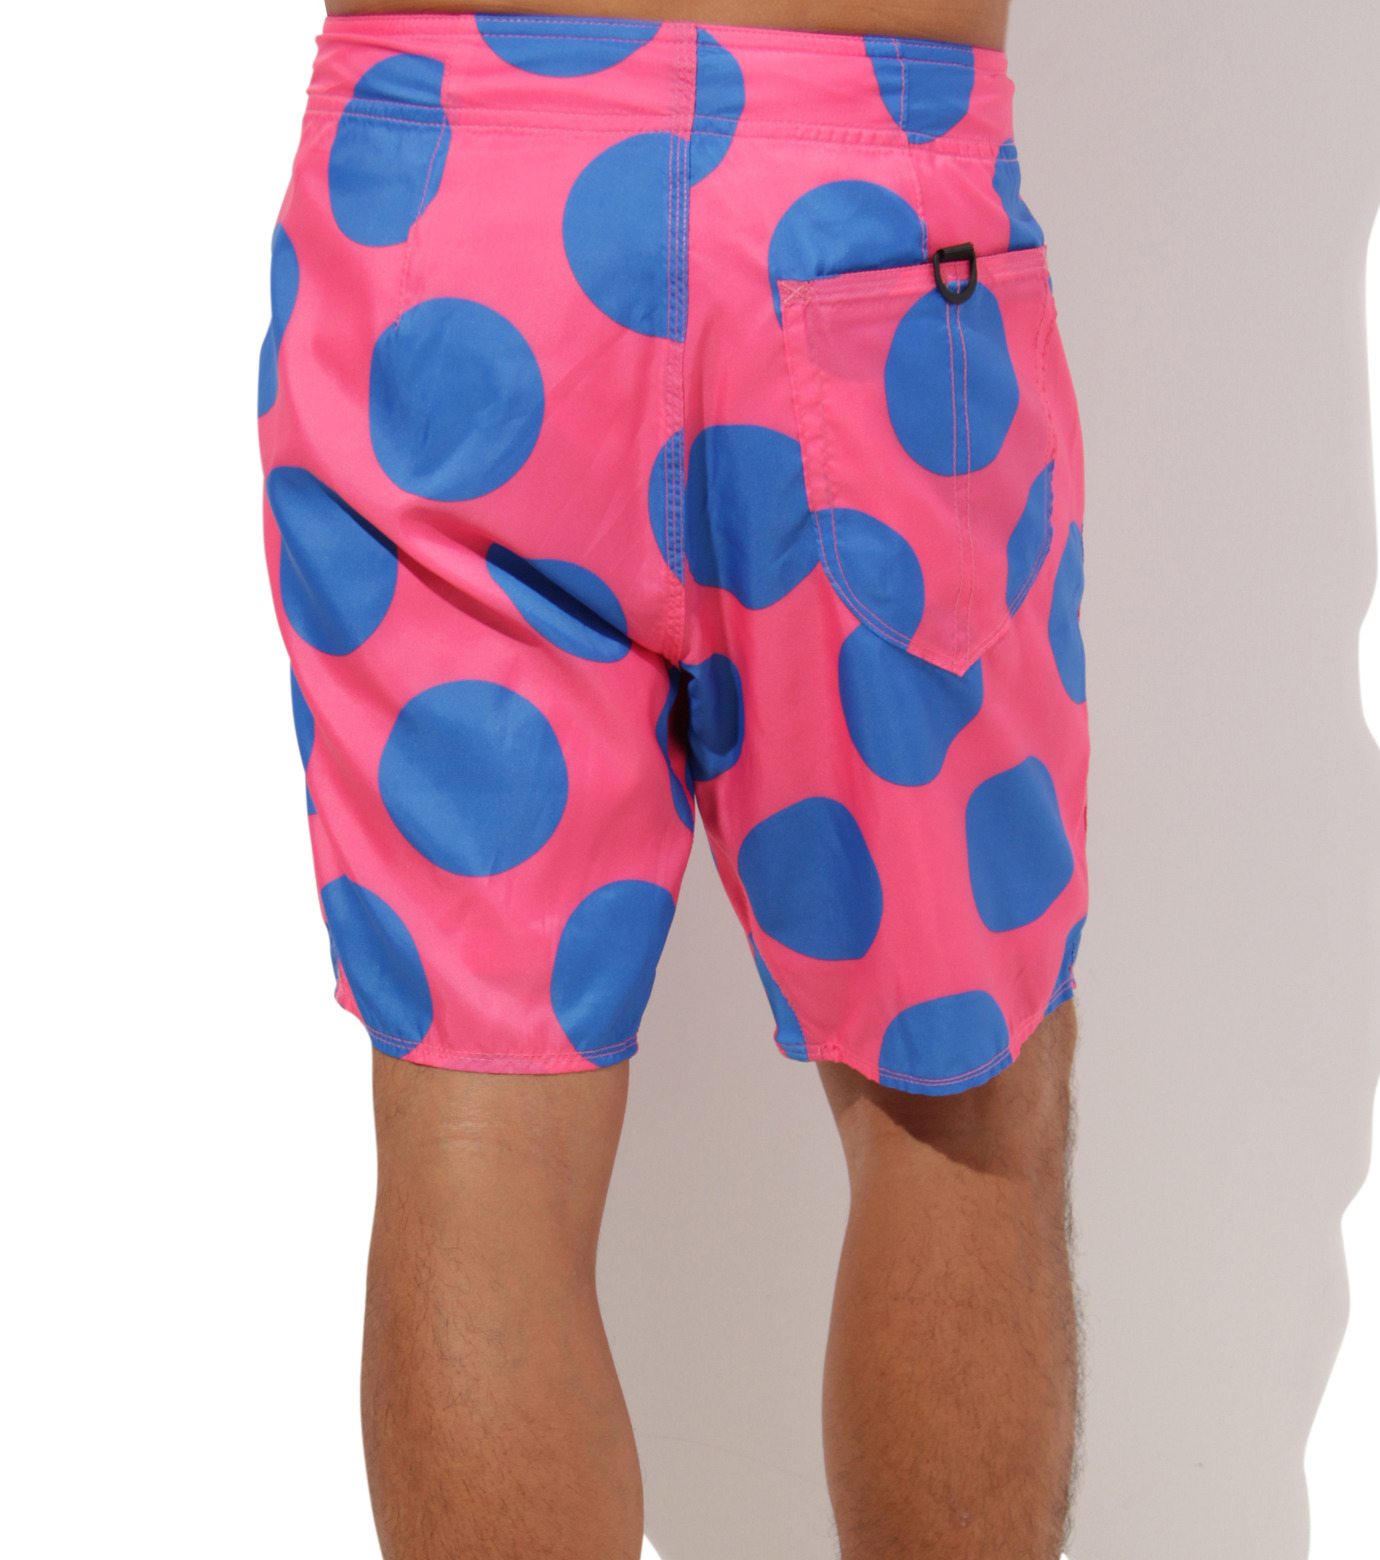 TWO TWO ONE(トゥートゥーワン)のDot surf shorts-SALMON PINK(SWIMWEAR/SWIMWEAR)-15N98003-73 拡大詳細画像4